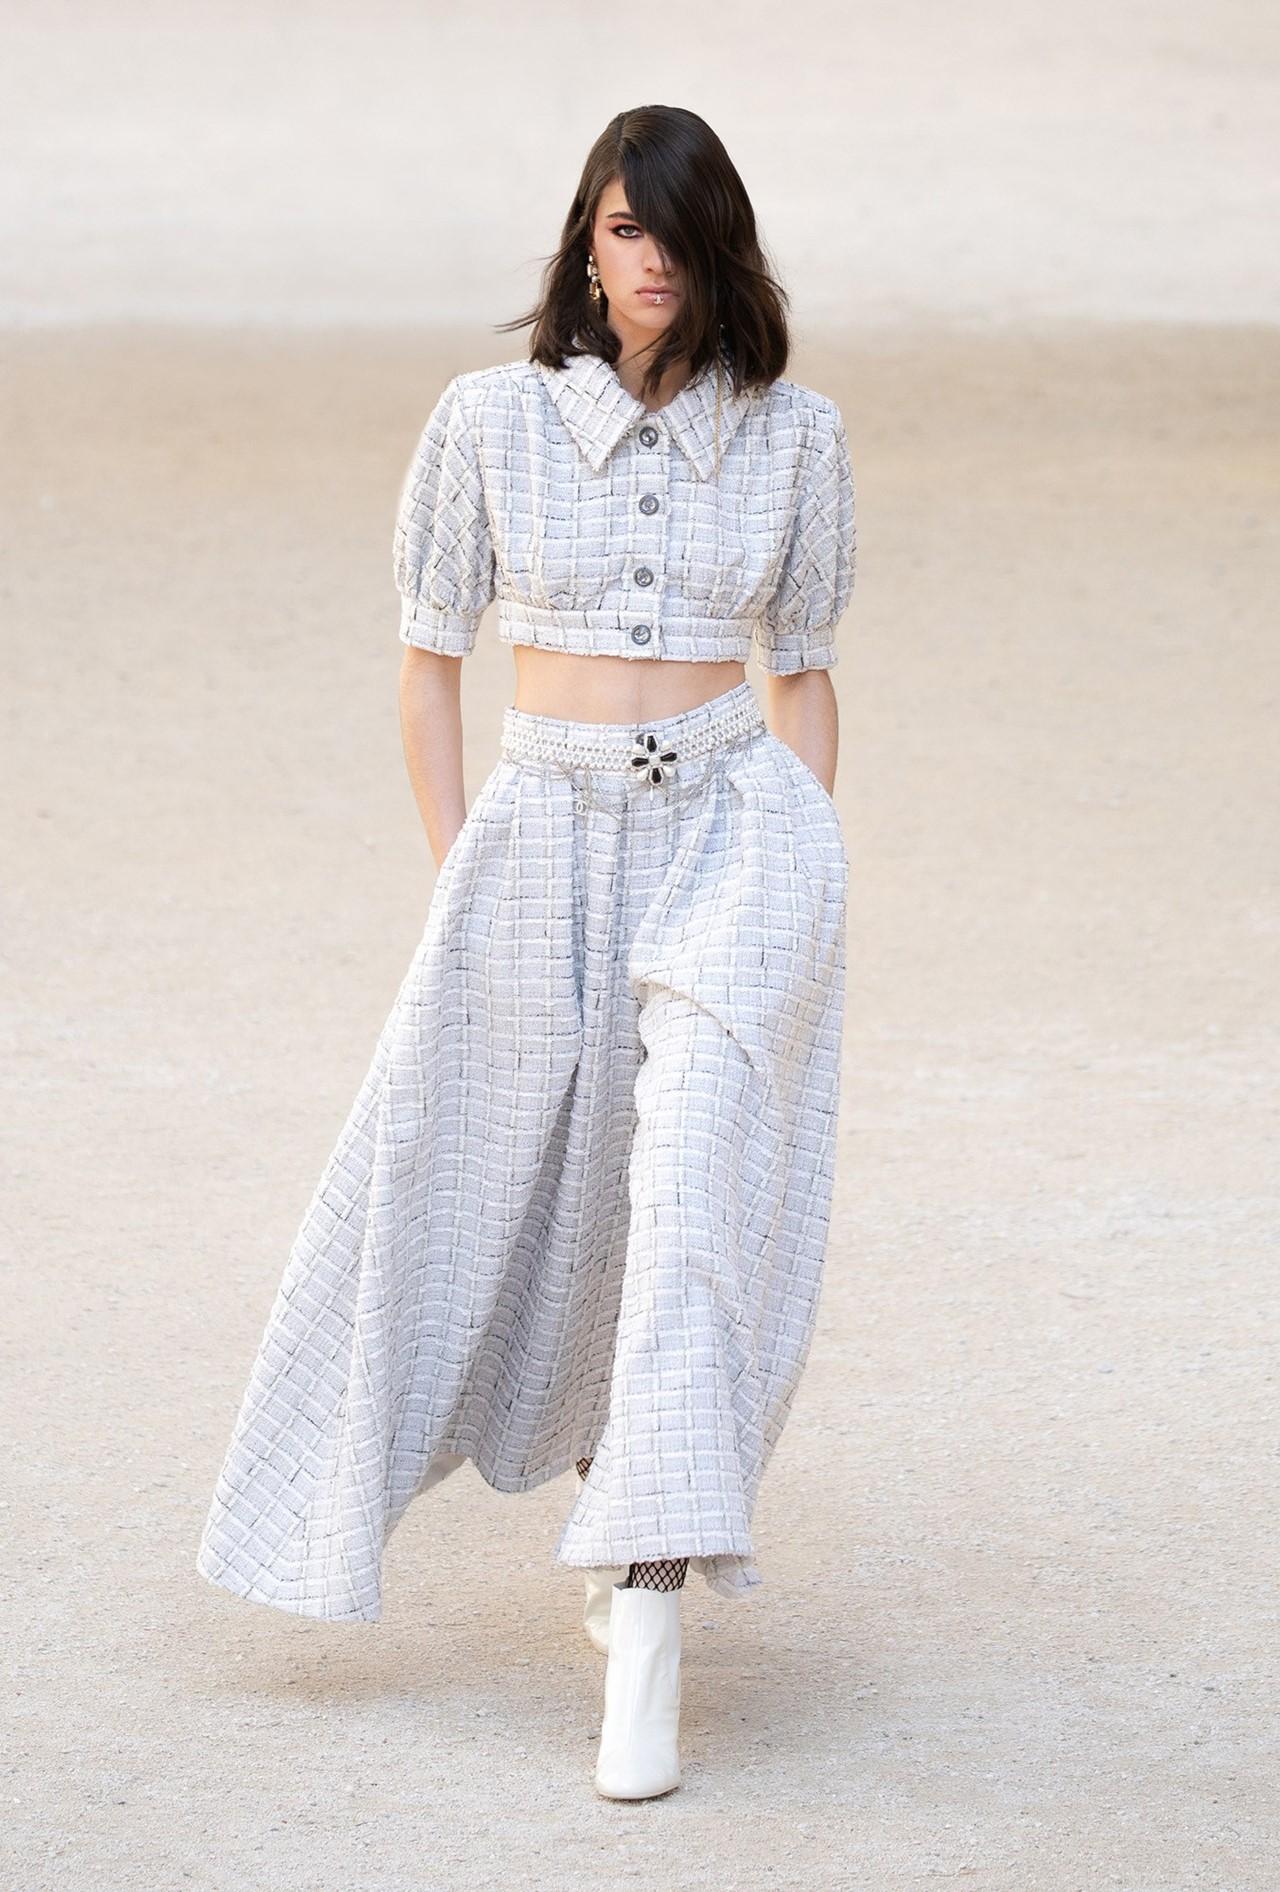 Chanel_Cruise_2022_Fashionela (35)